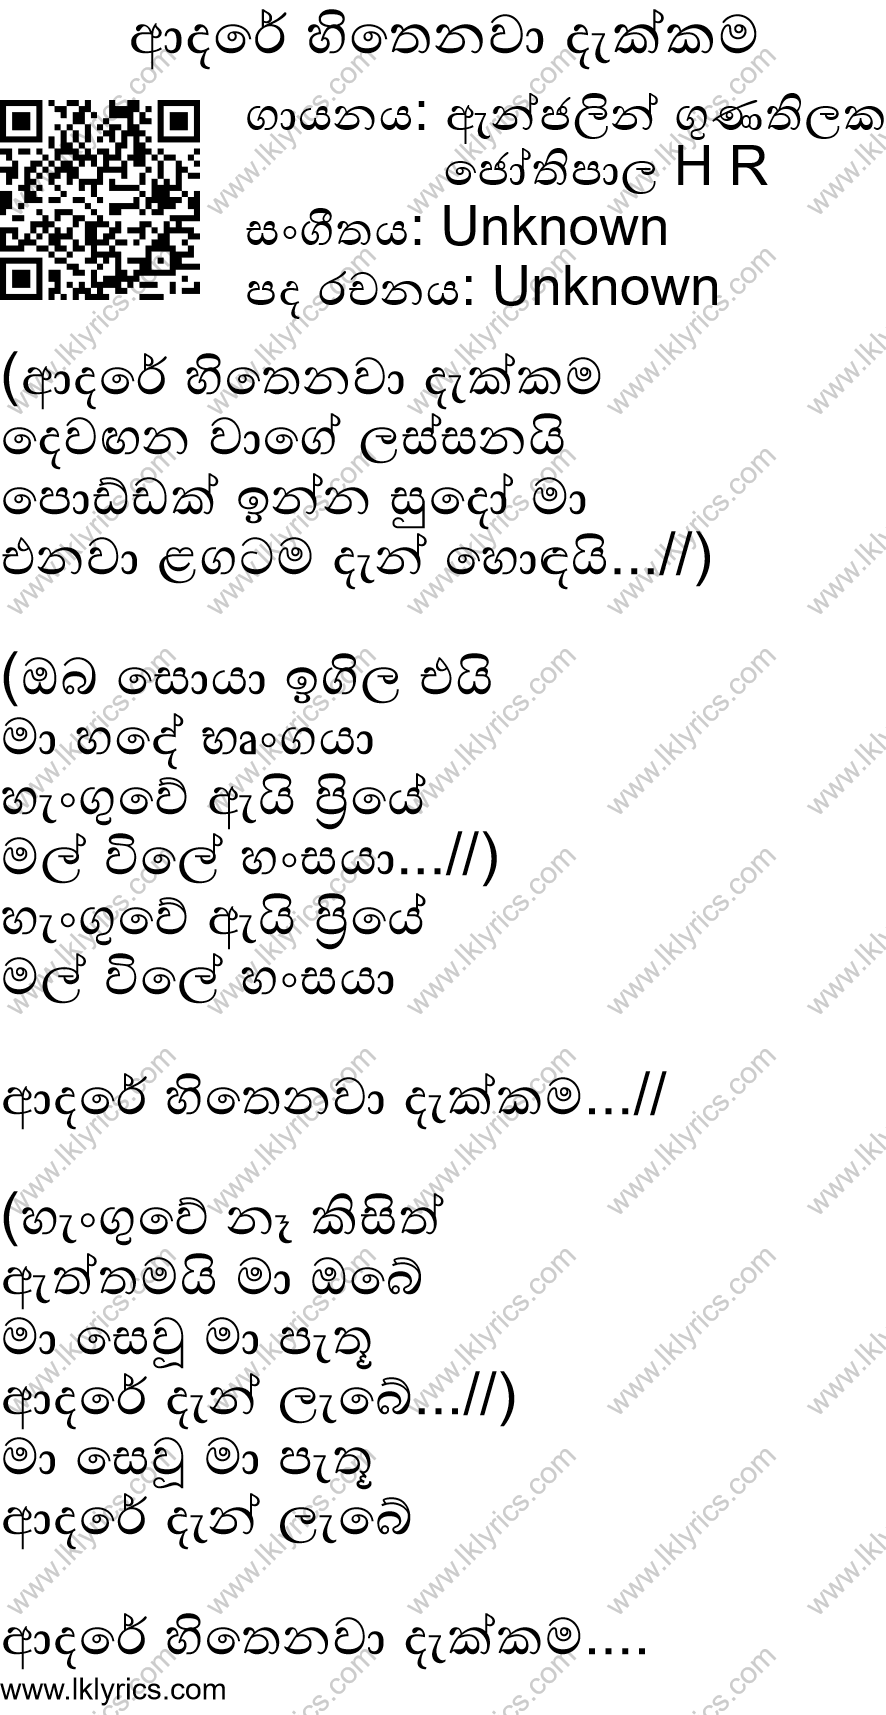 Adare Hithenawa Dakkama Lyrics Lk Lyrics